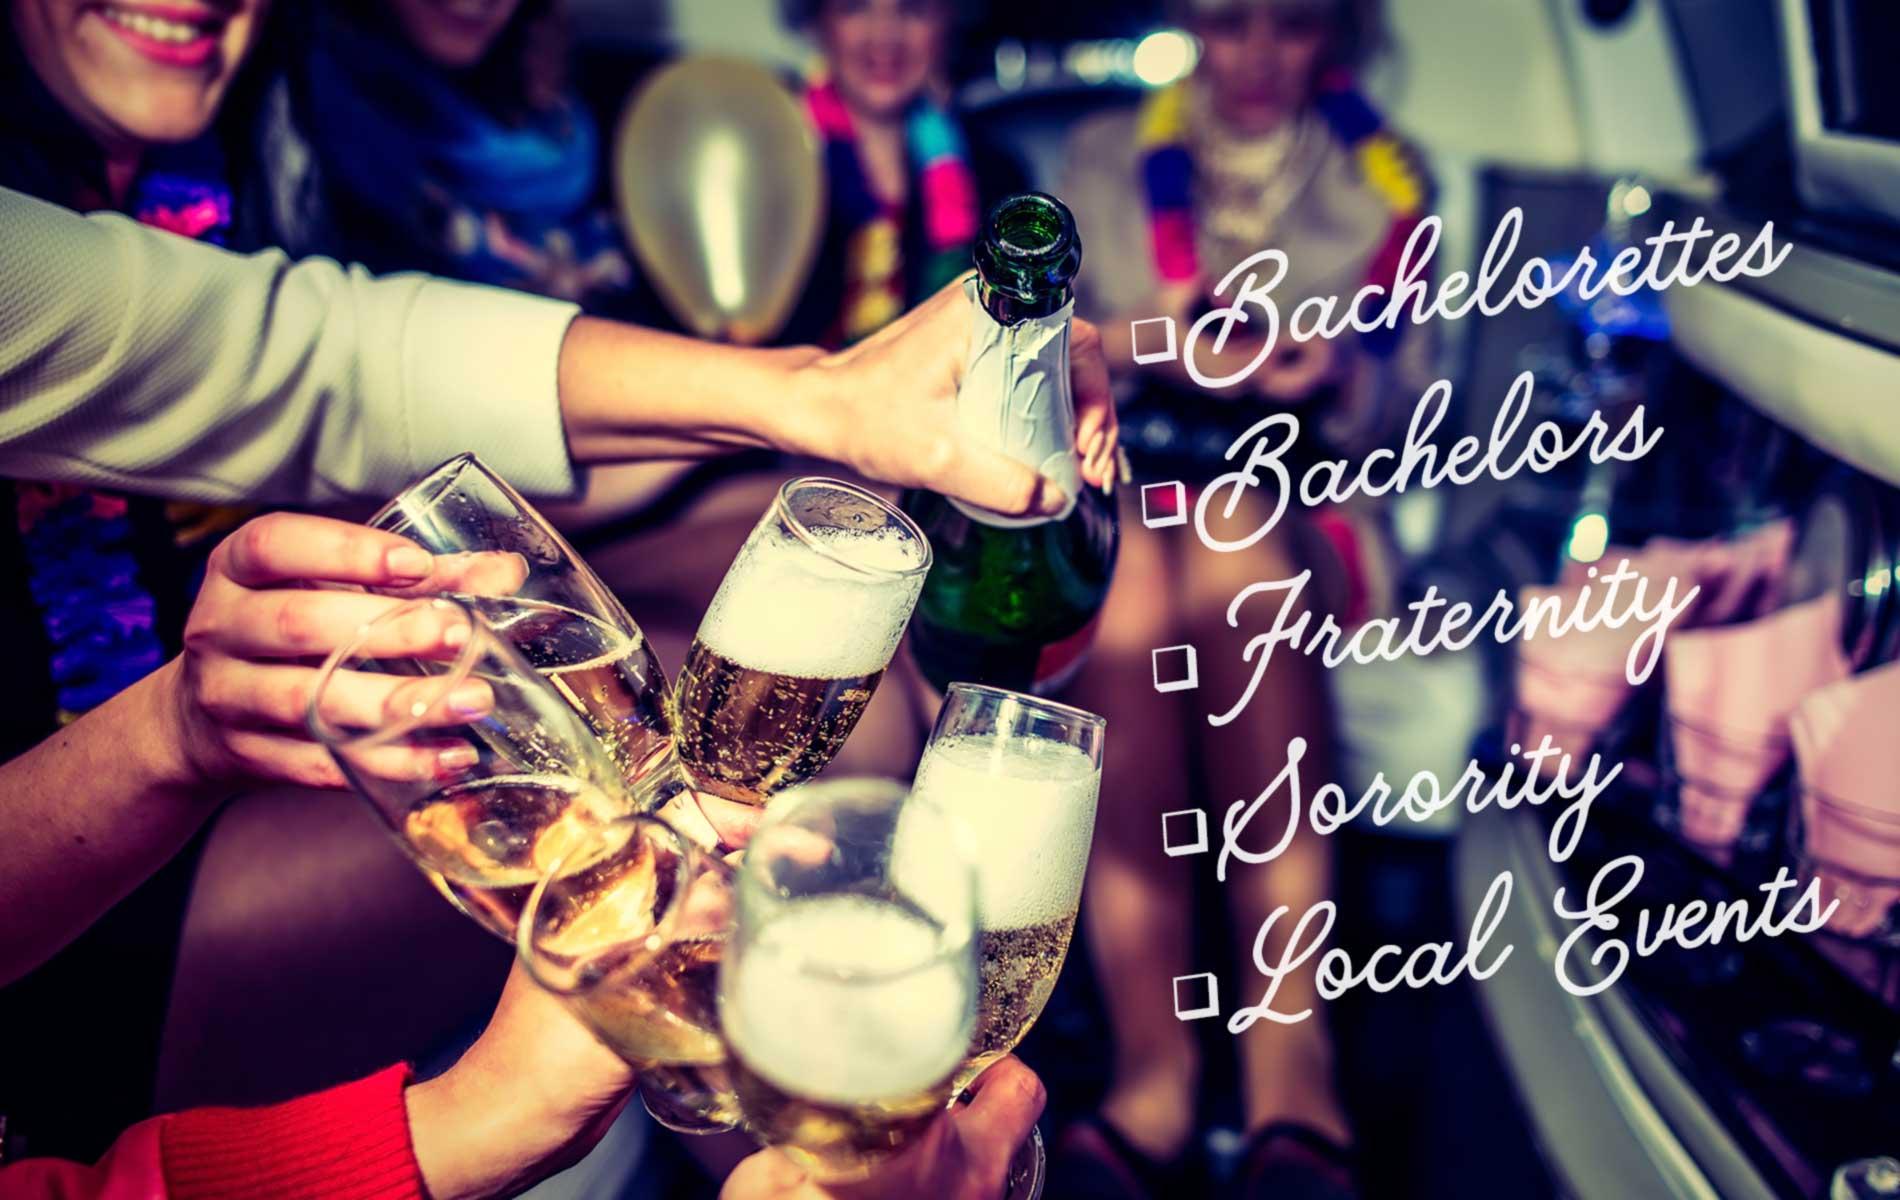 Bachelorette Party In Charleston SC